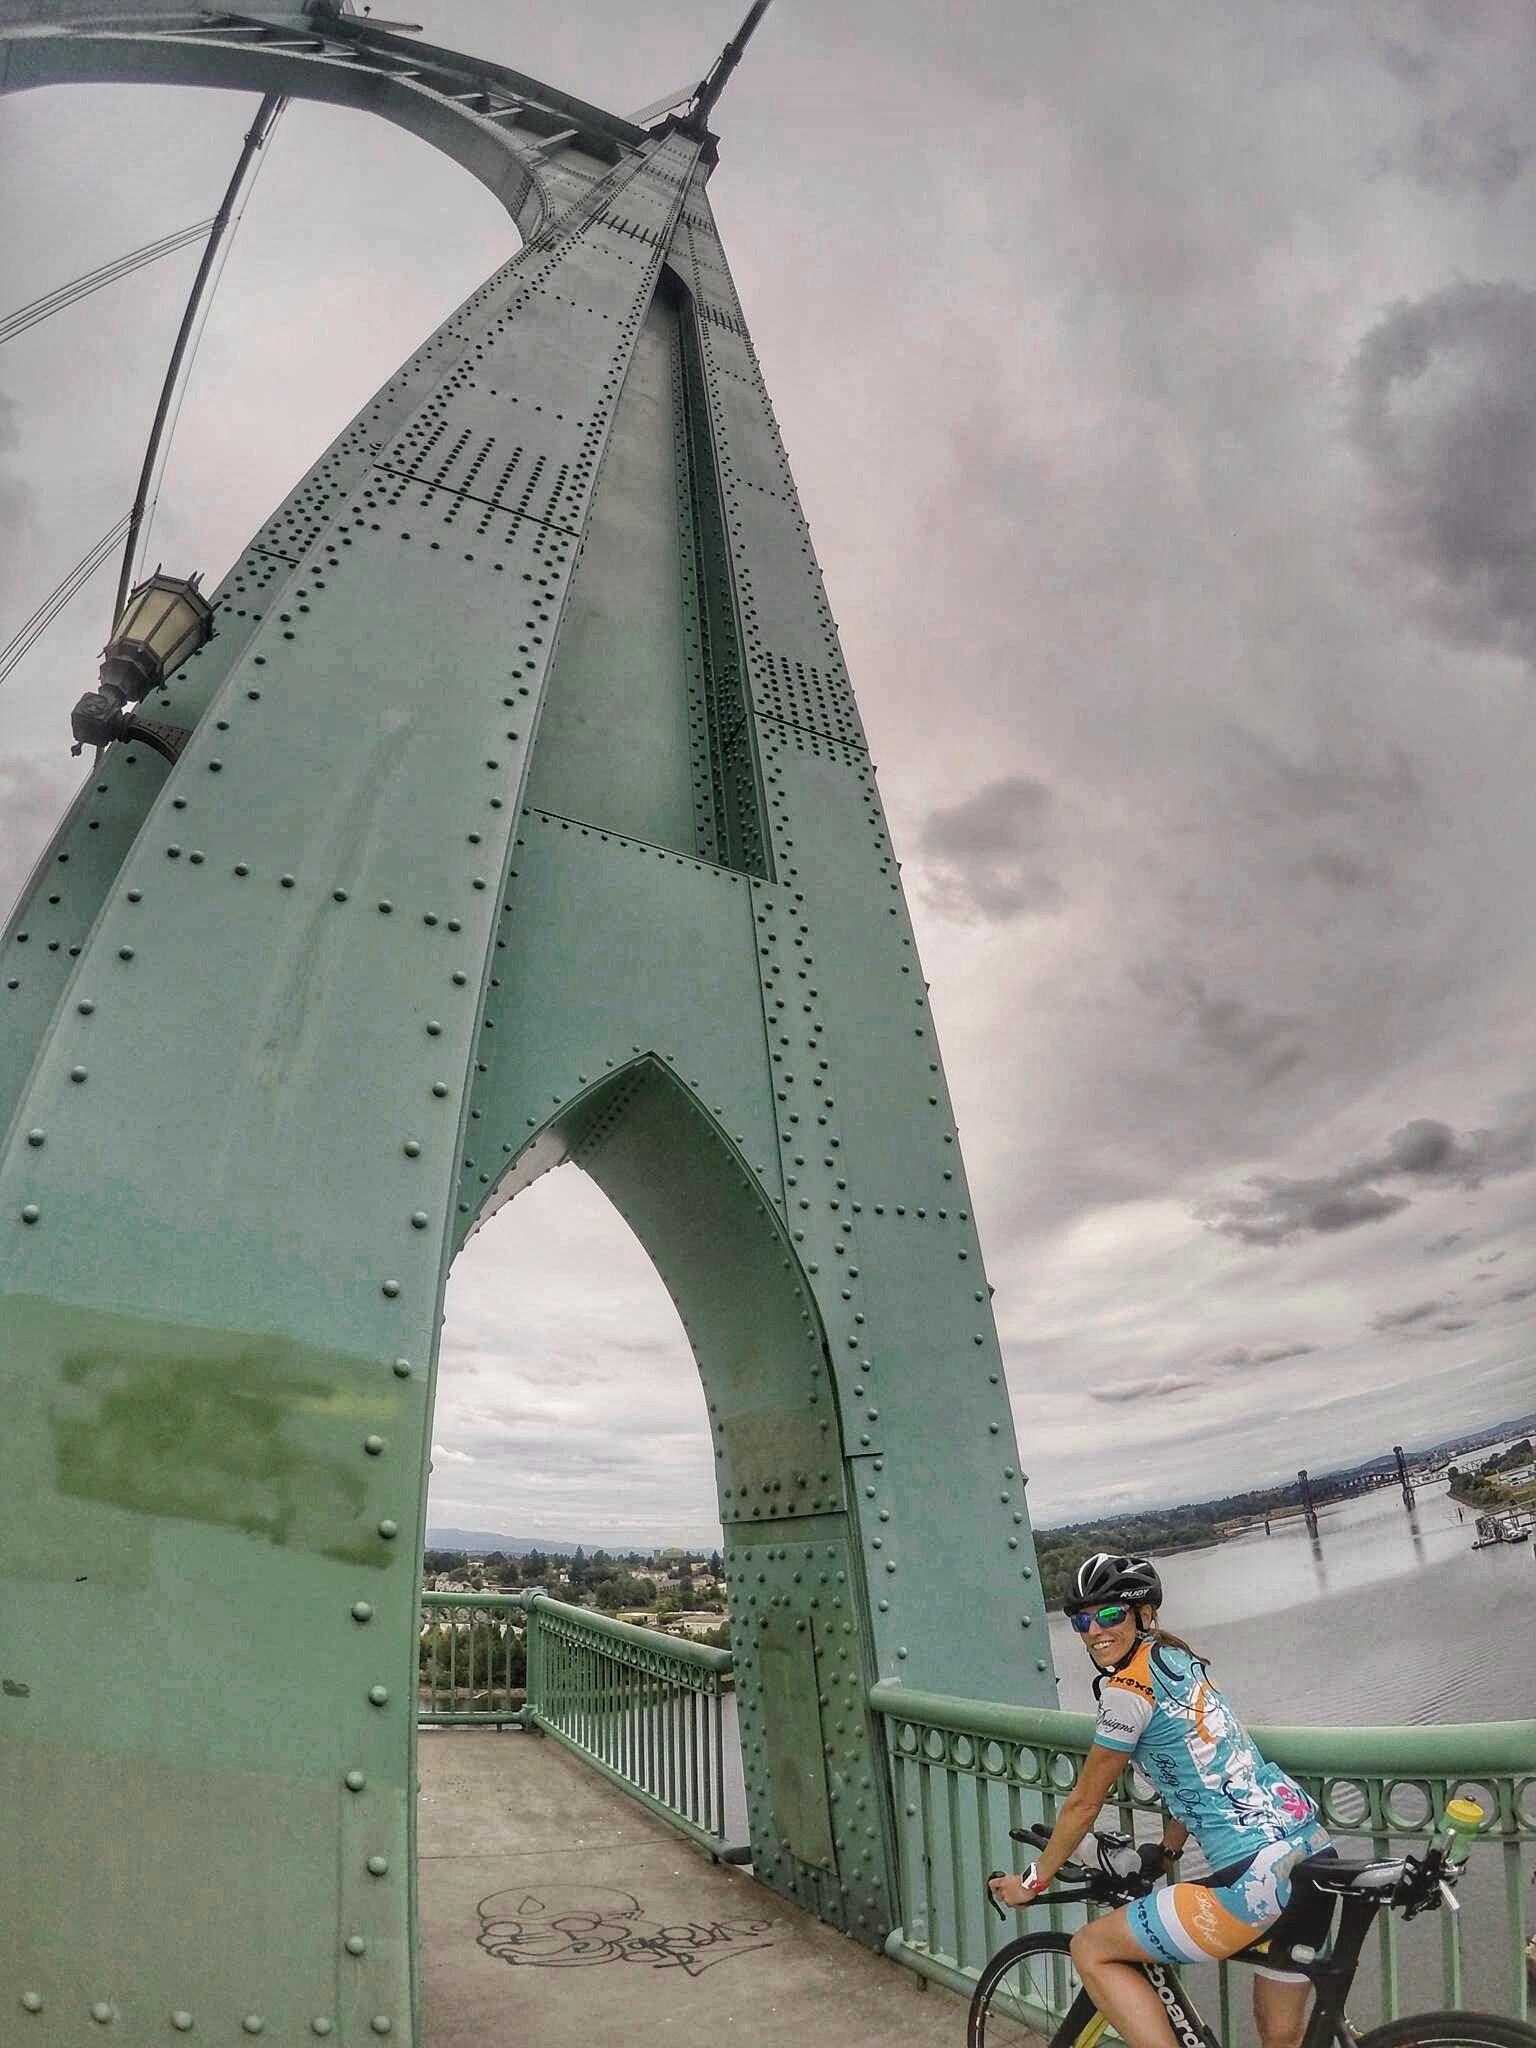 Crossing one of many bridges on our ride in Portland (St John's Bridge)